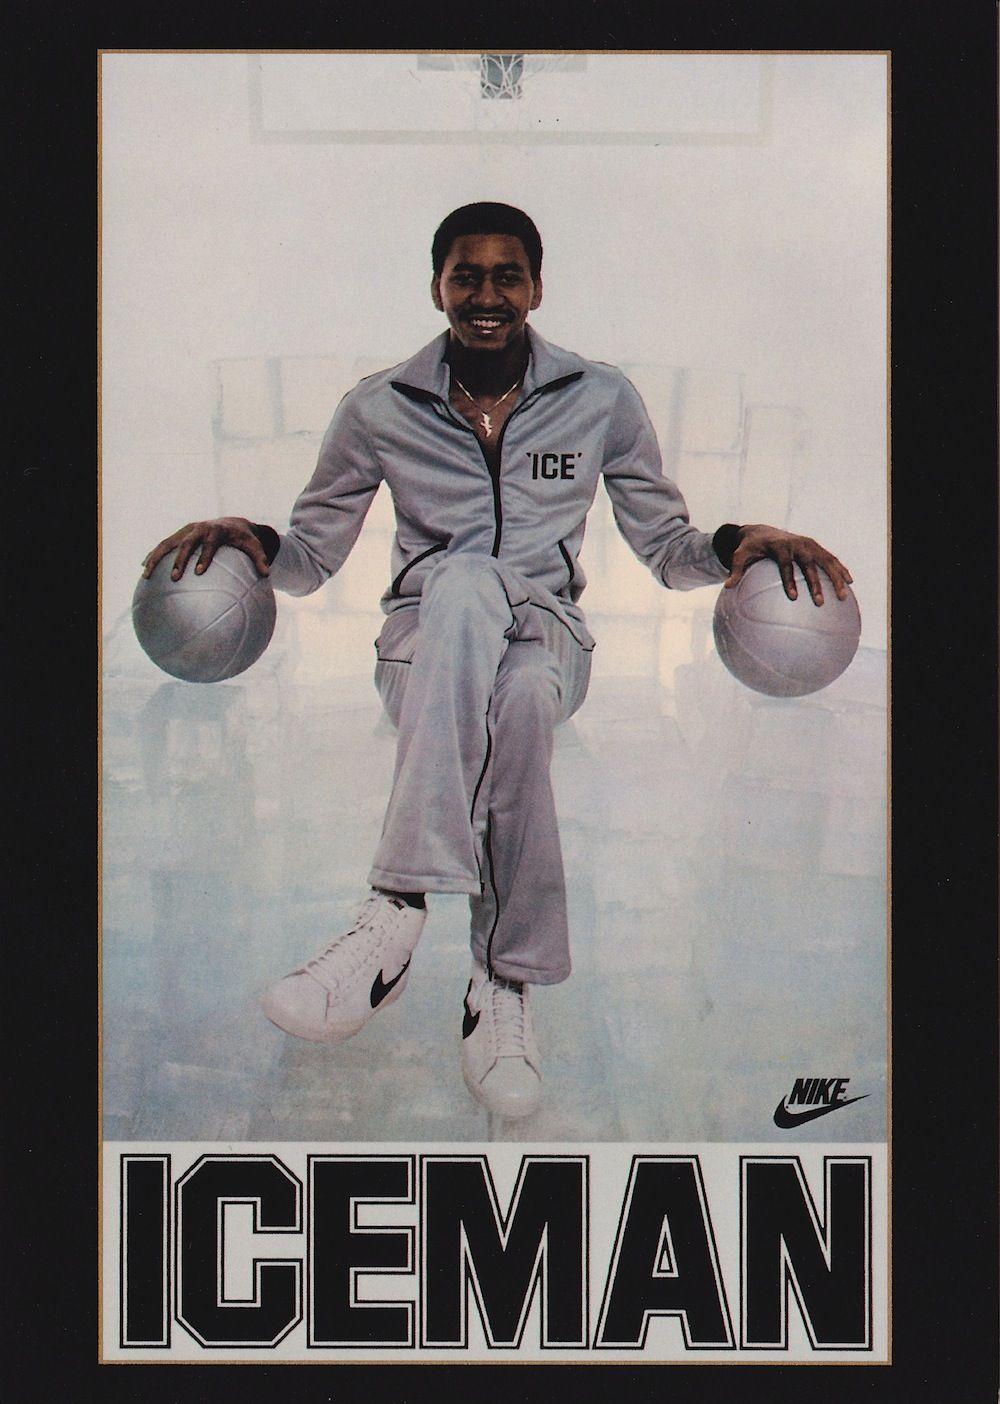 """The Iceman"" Gervin gervin, Basketball"